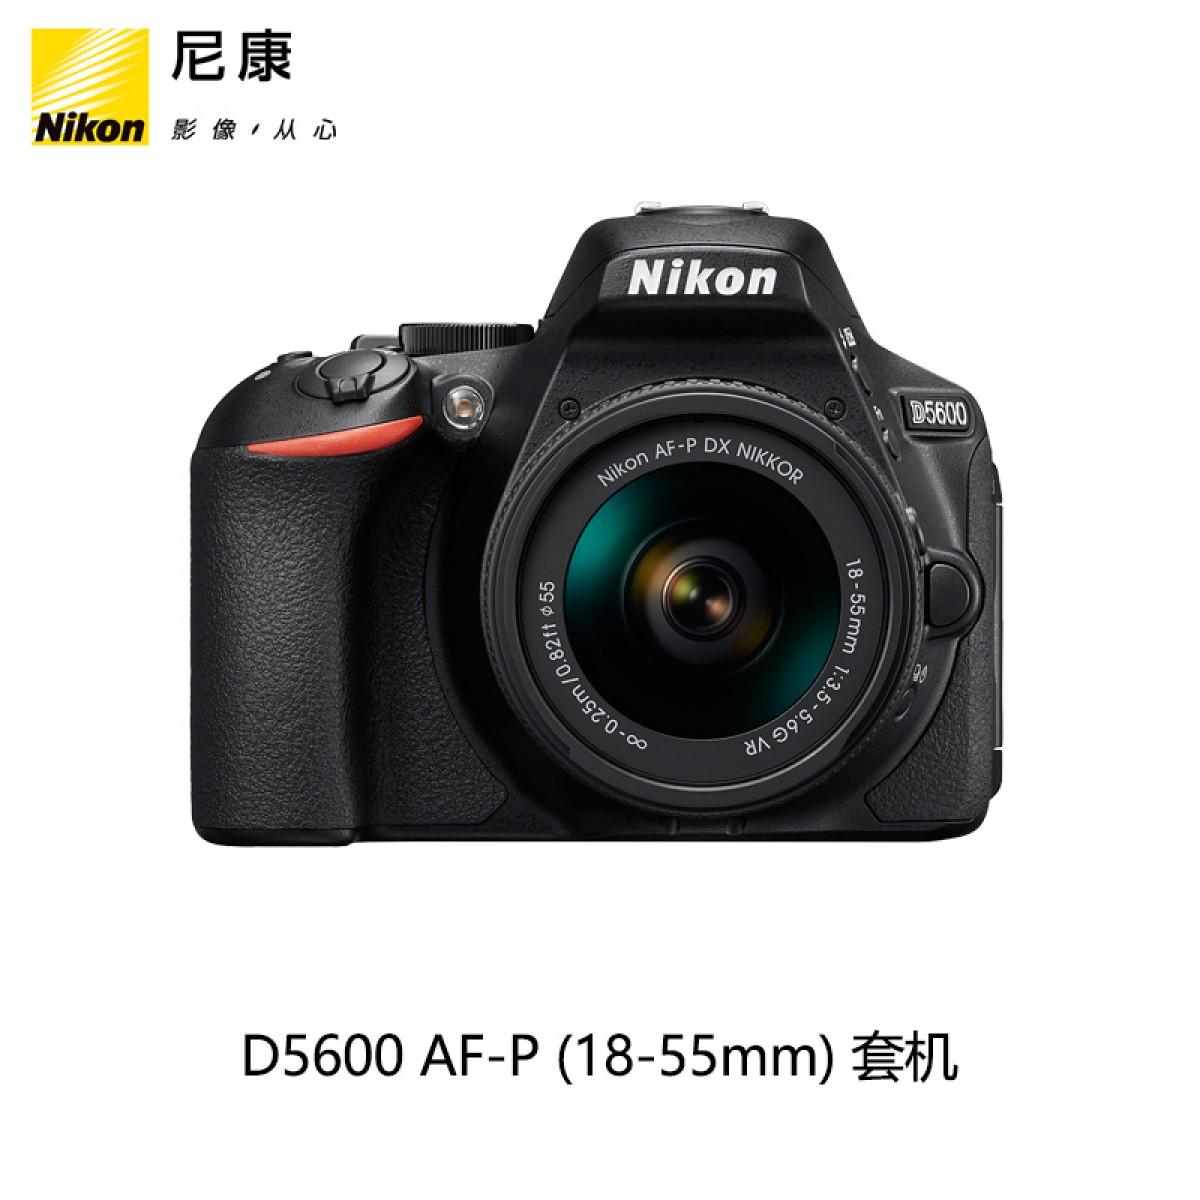 Nikon/尼康 D5600套机18-55mm入门级数码单反相机